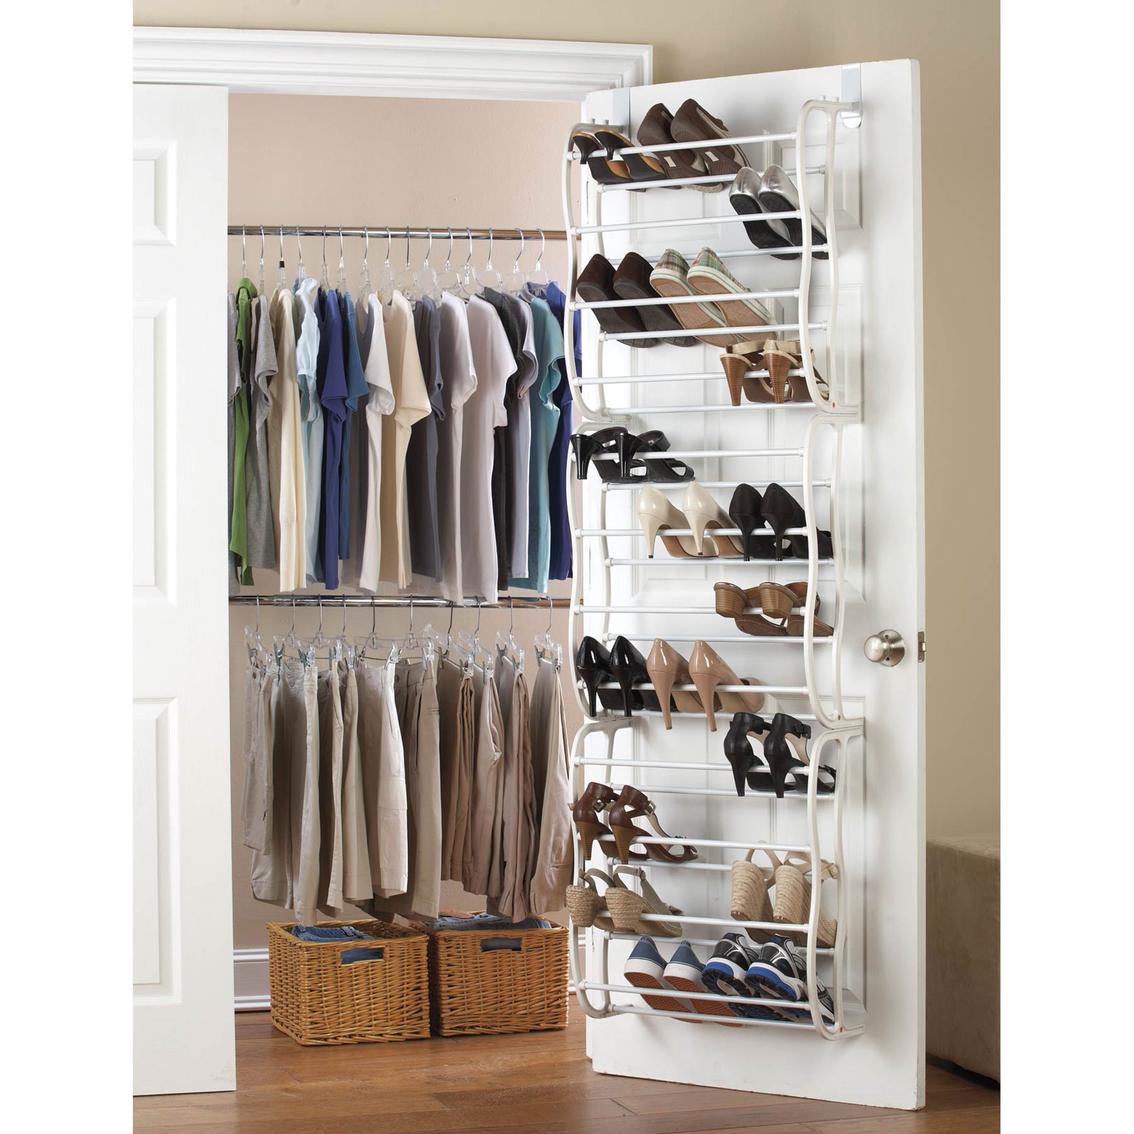 Simply Perfect Over The Door Shoe Rack Closet